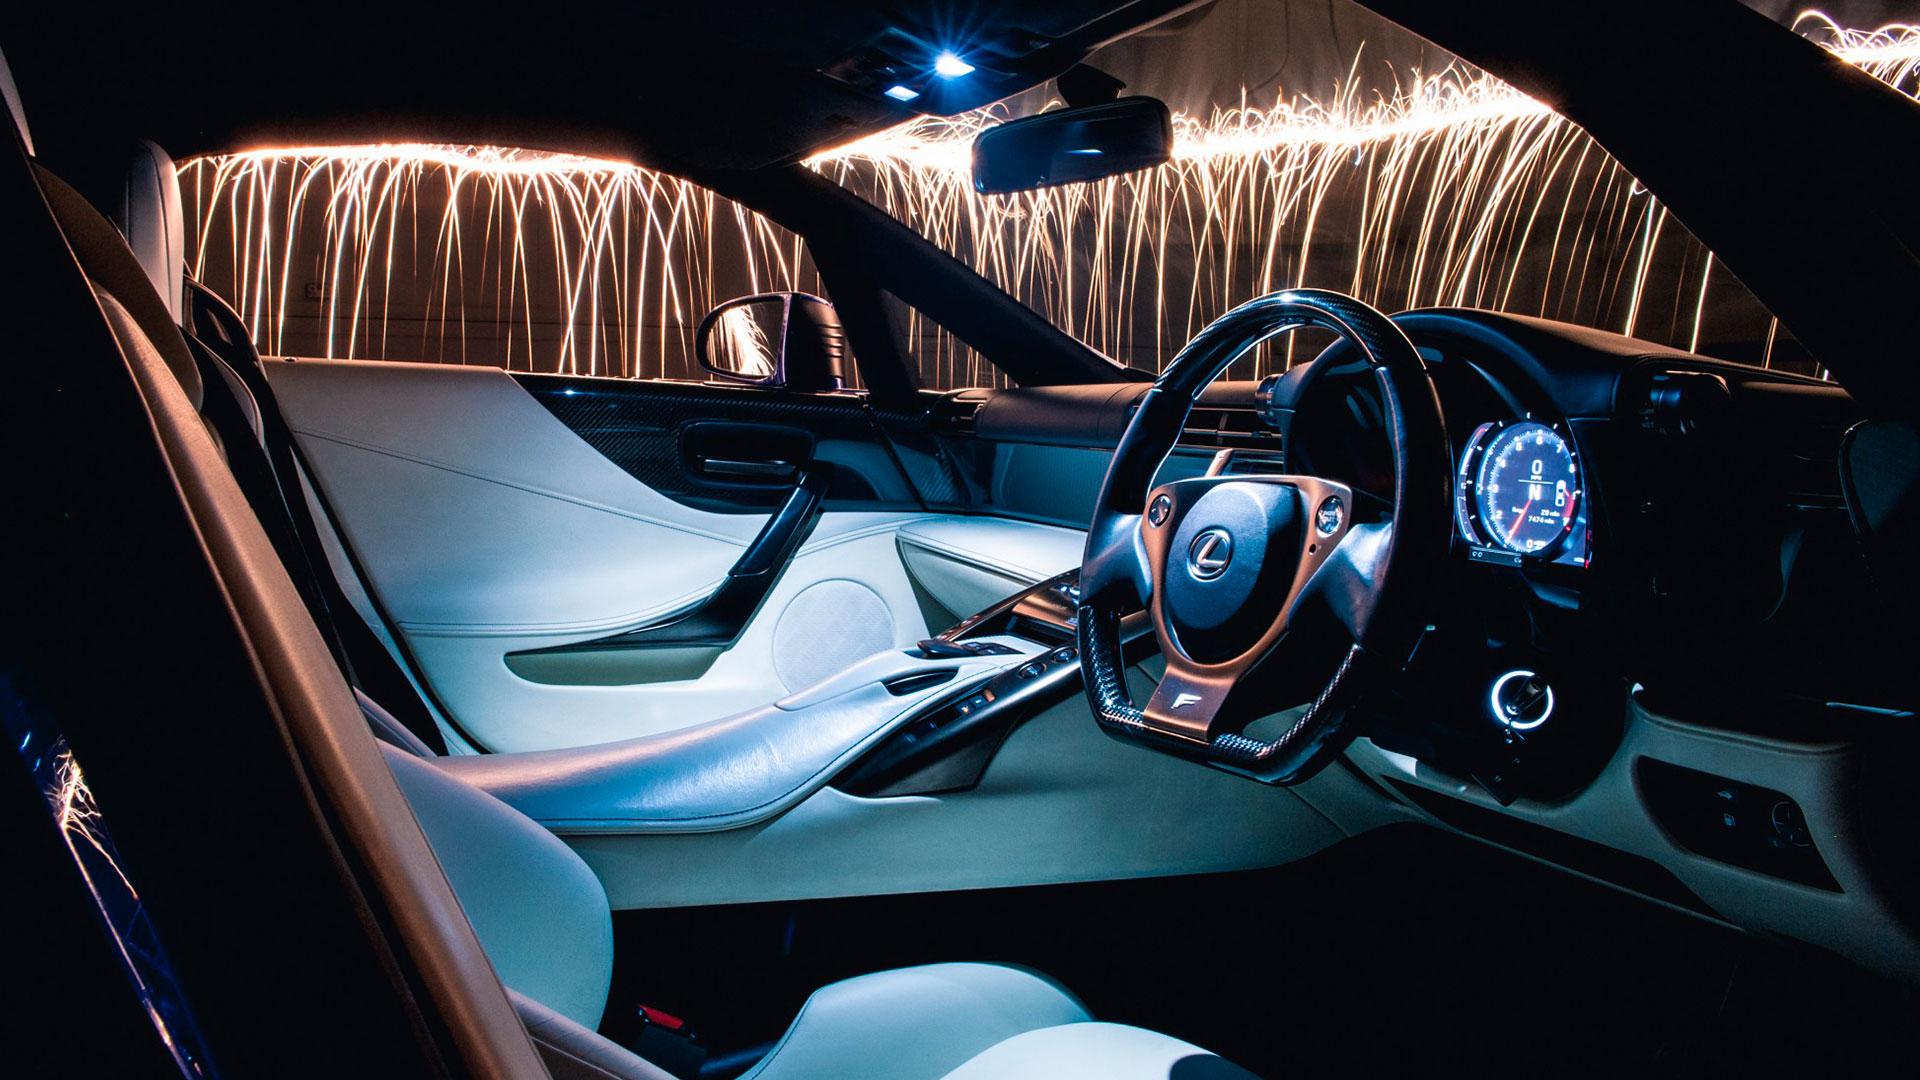 90 de las ventas Lexus hero asset